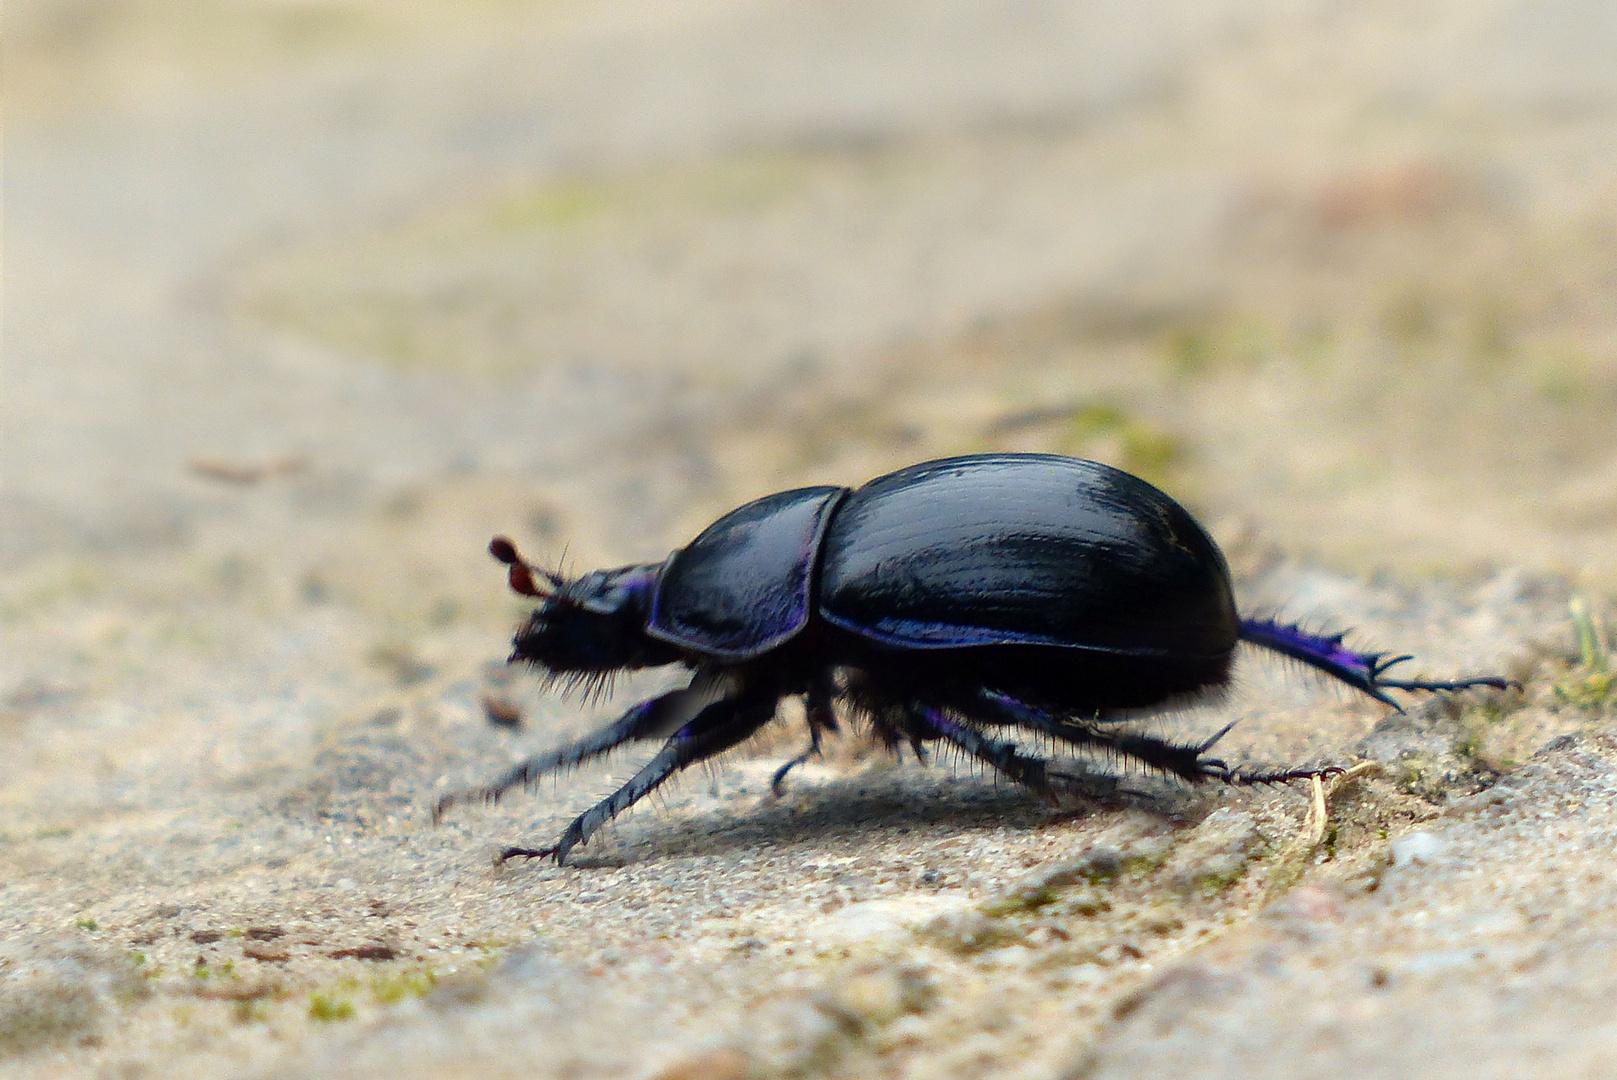 ...one blue beetle